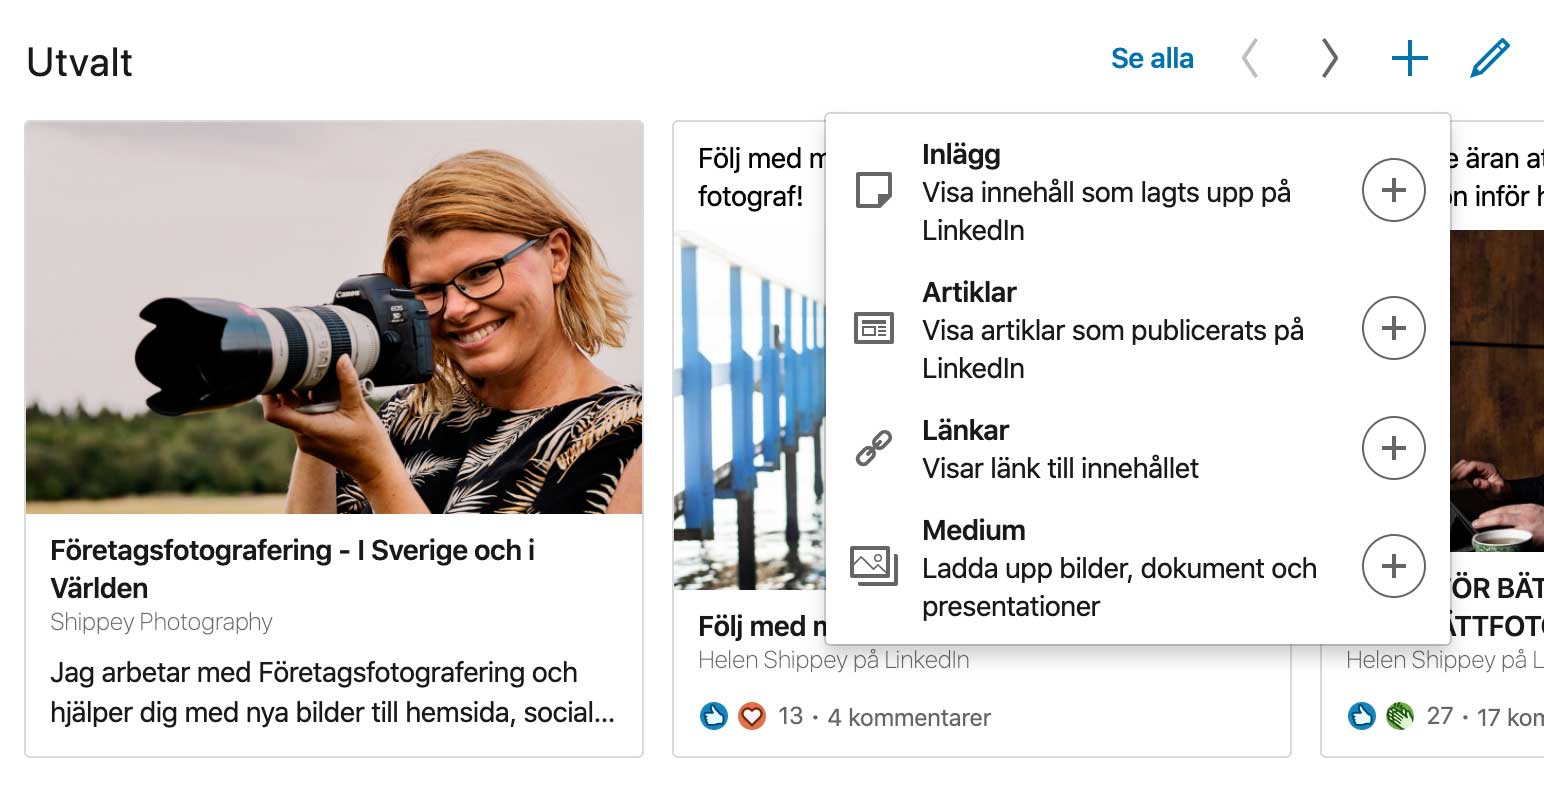 Profilbild LinkedIn